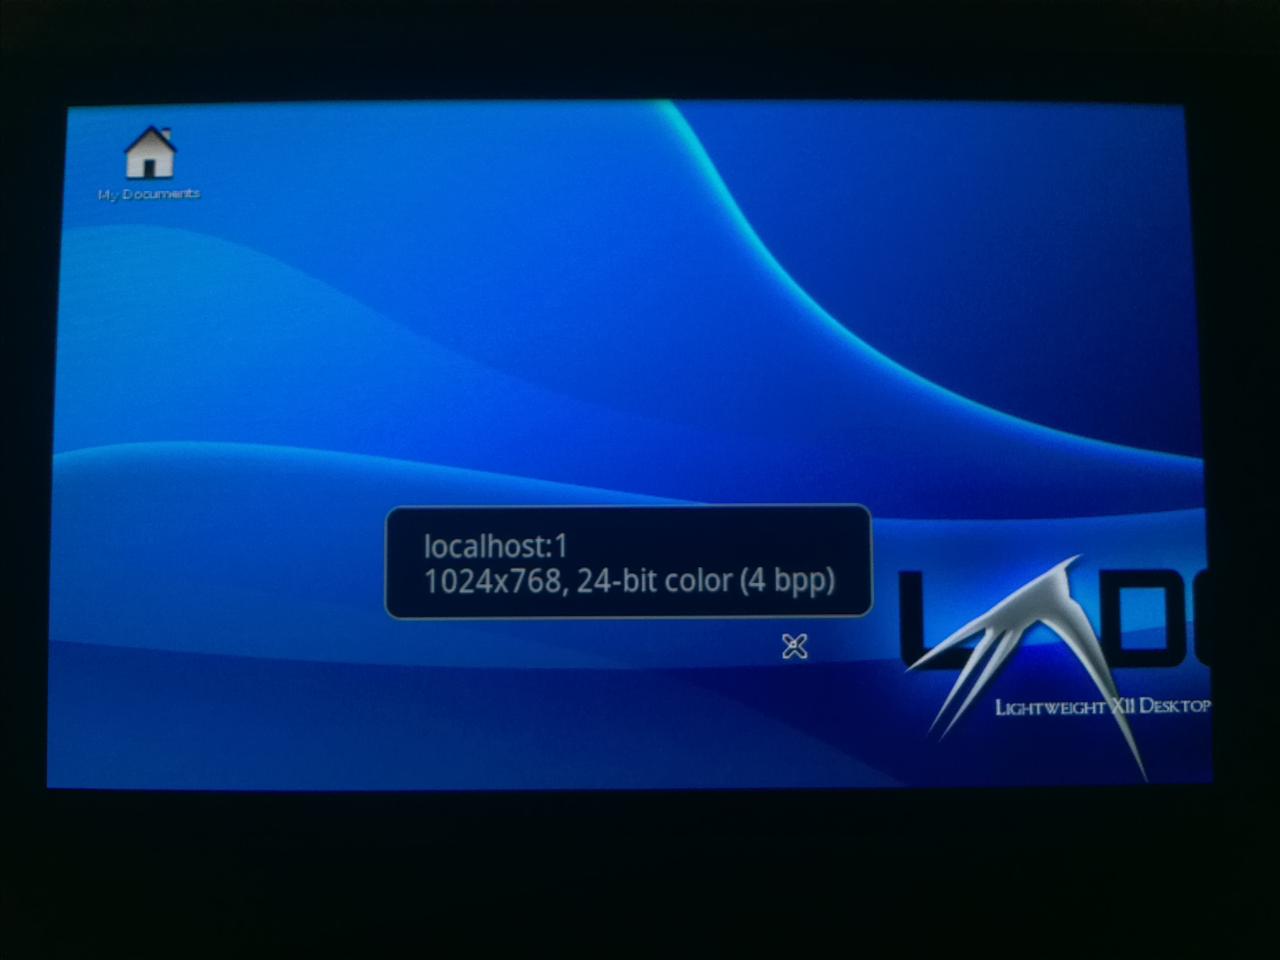 Ubuntu SGS2 VNC info